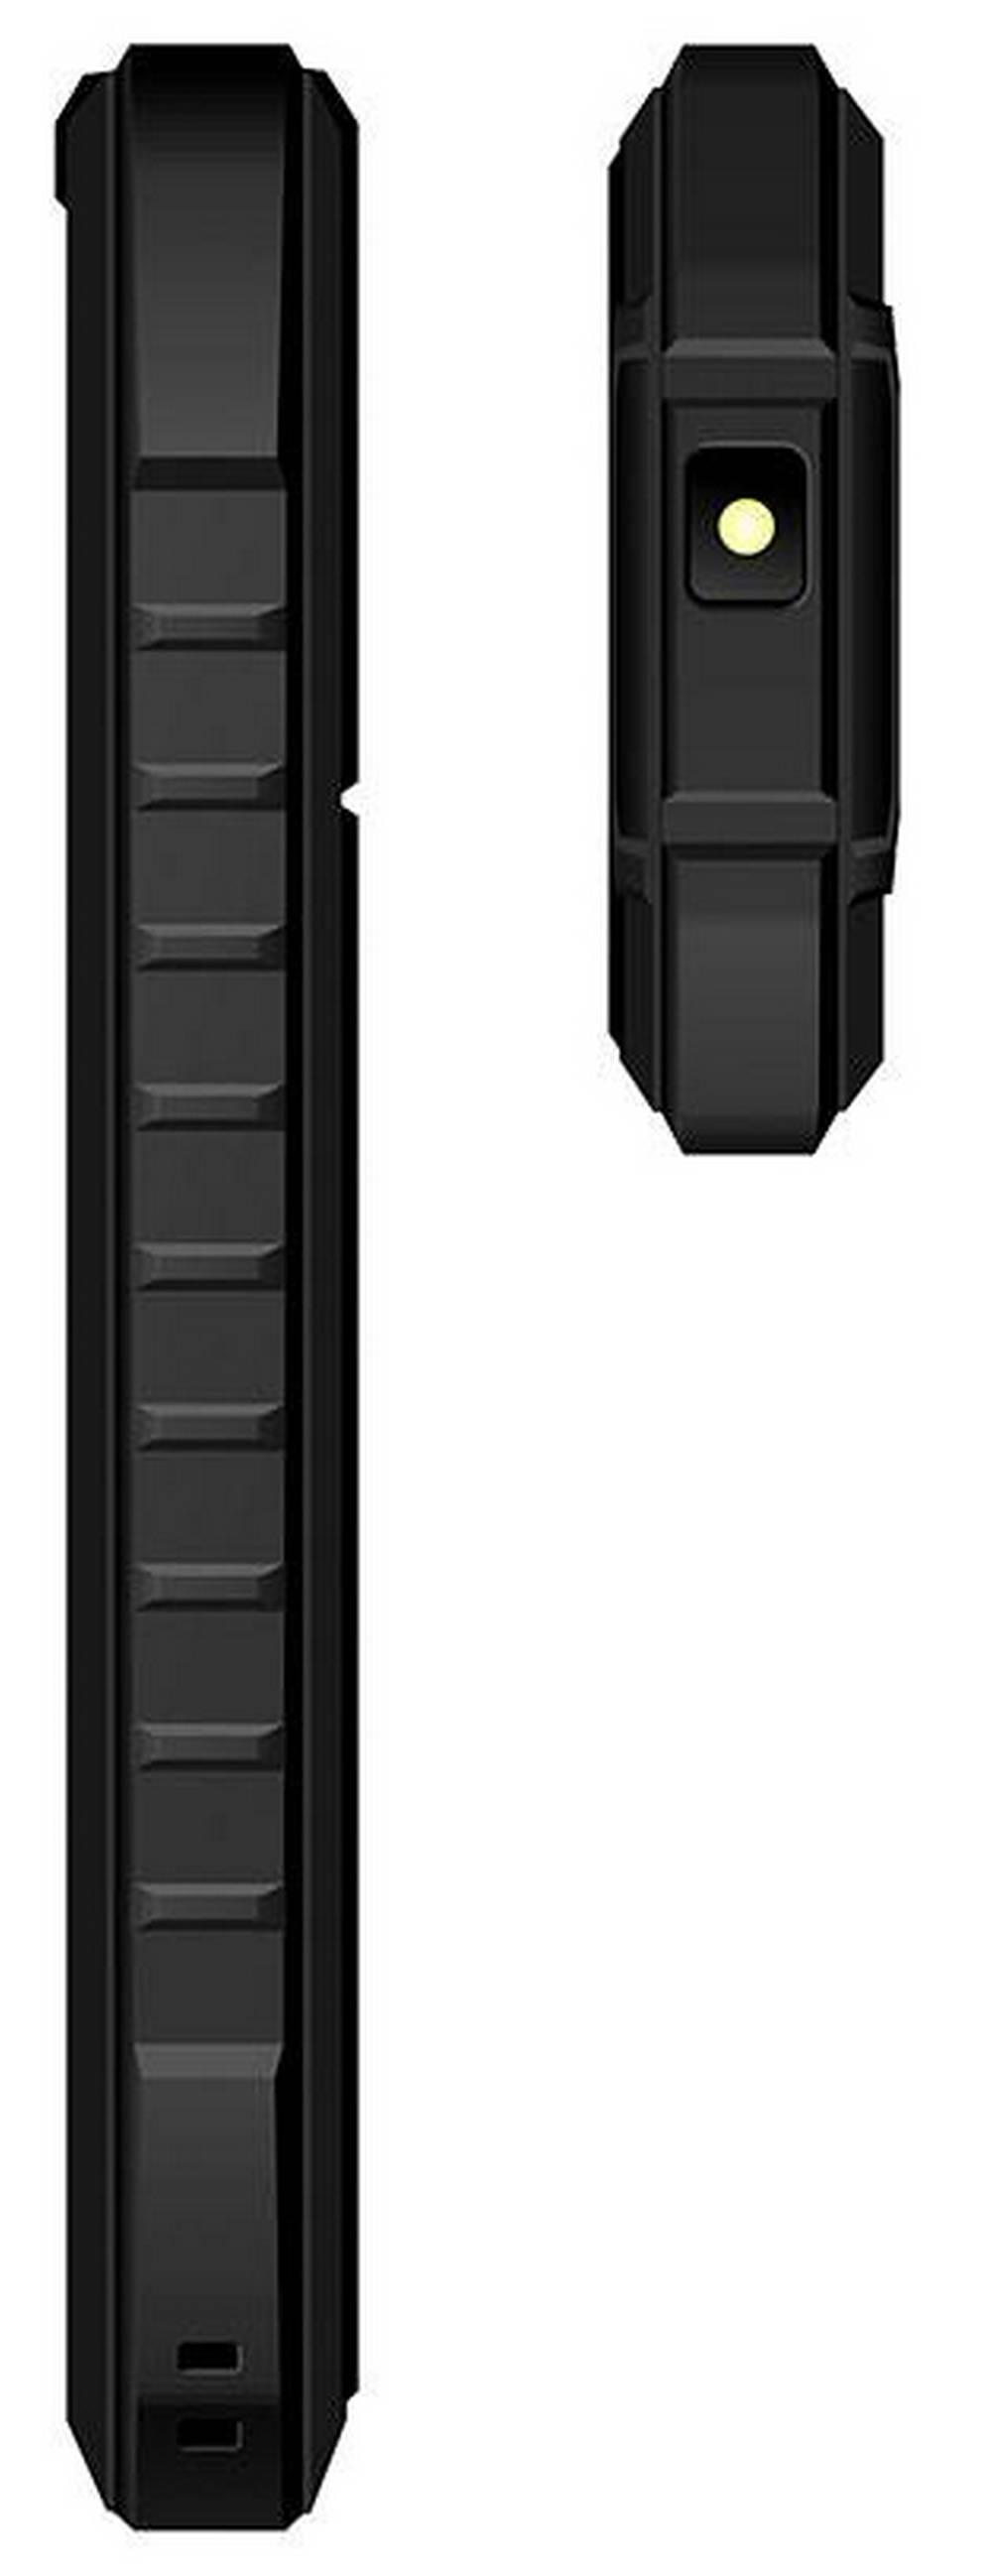 "Maxcom Strong MM916 3G (Dual Sim) 2.4"" Water-dust proof IP67 με Bluetooth, Φακό, Ραδιόφωνο και Κάμερα Μαύρο"